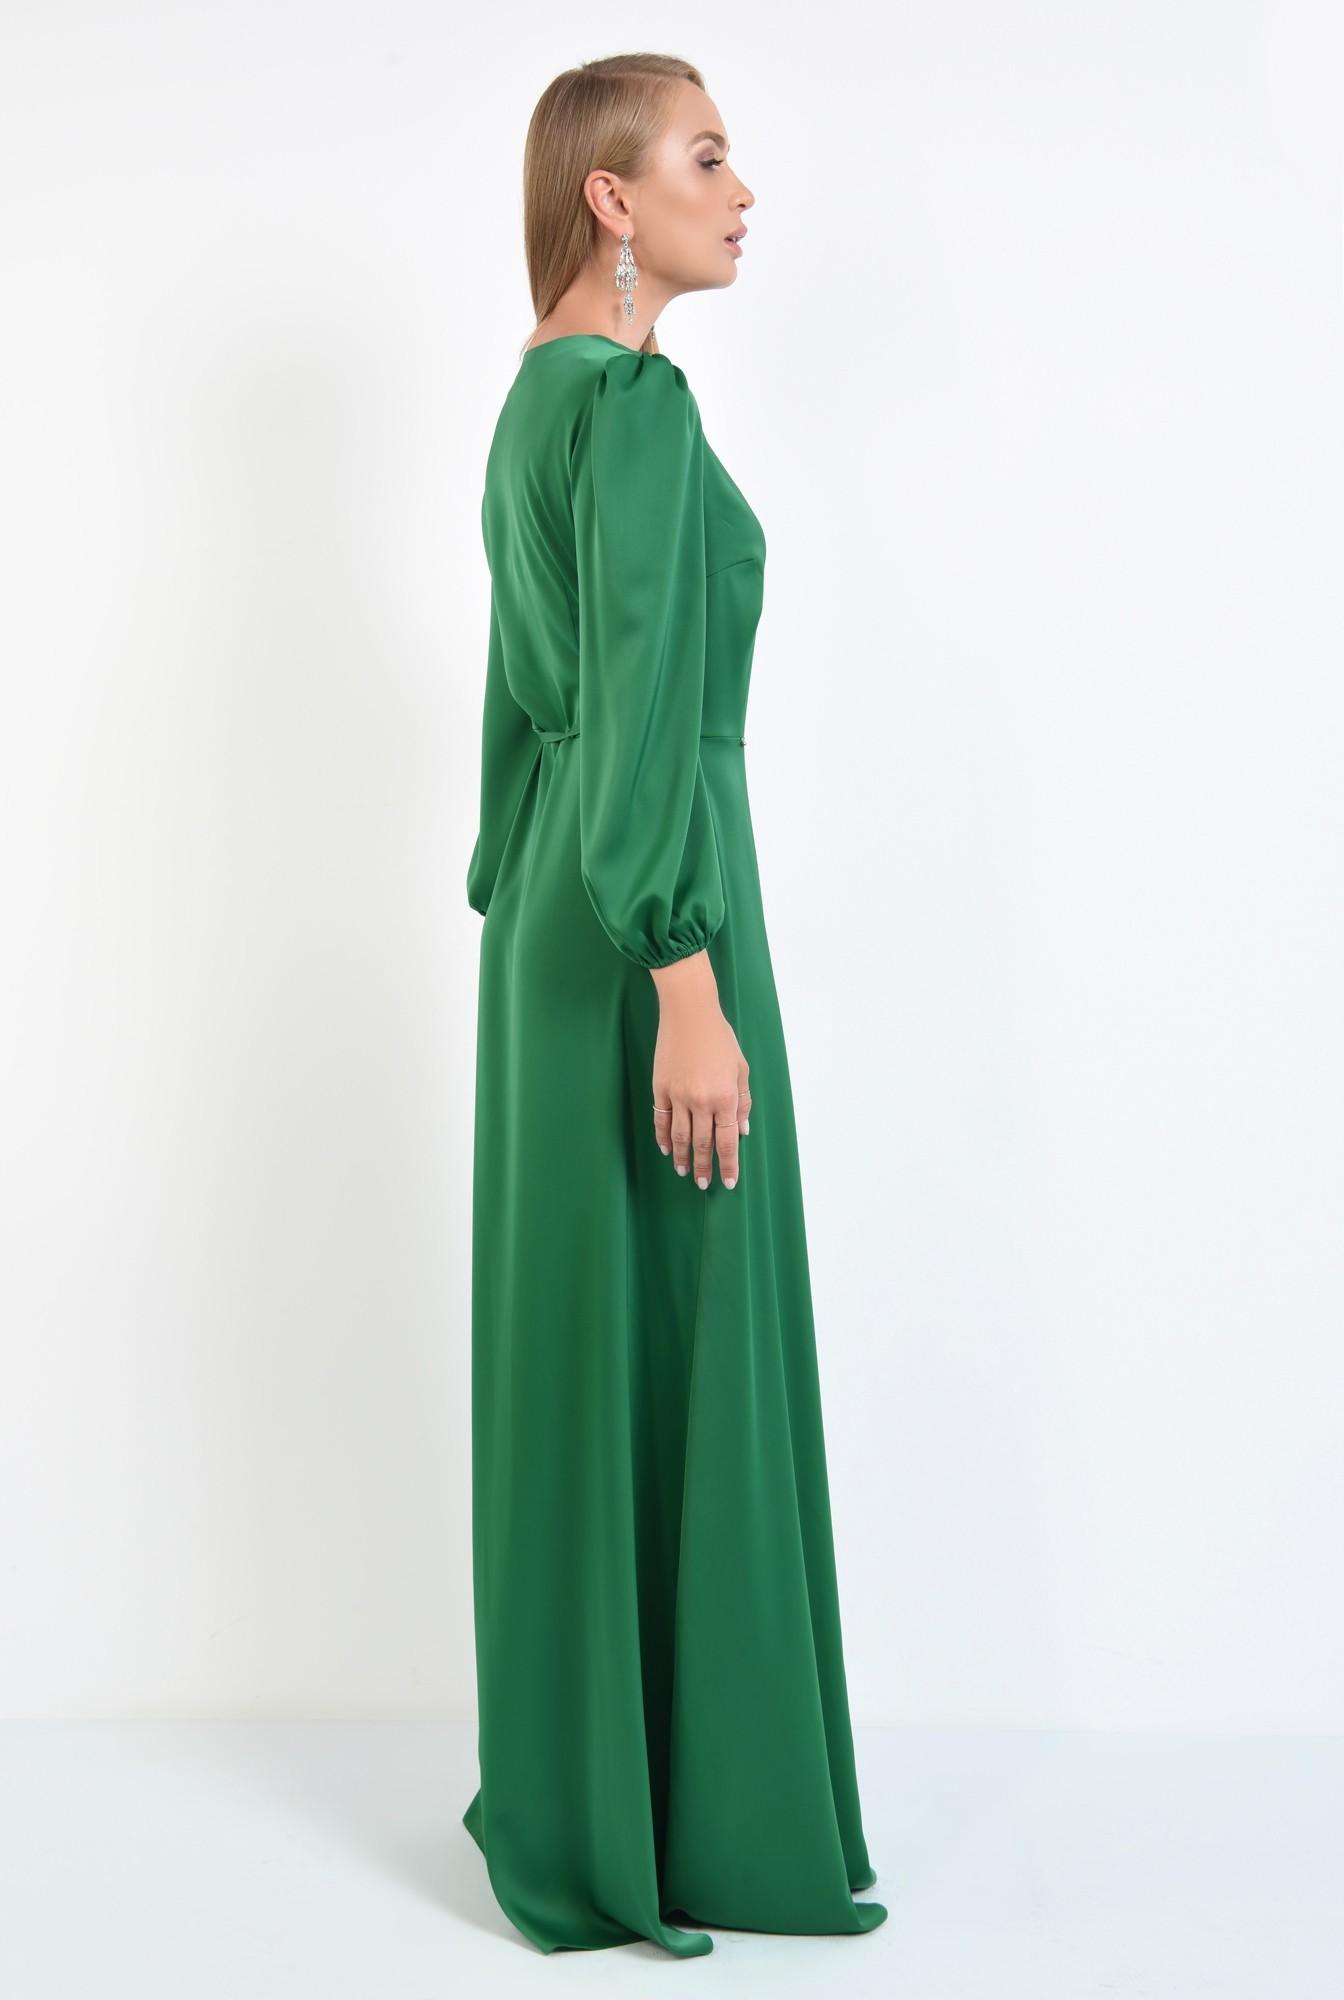 1 - rochie de seara, slit adanc, verde, satin, rochie maxi